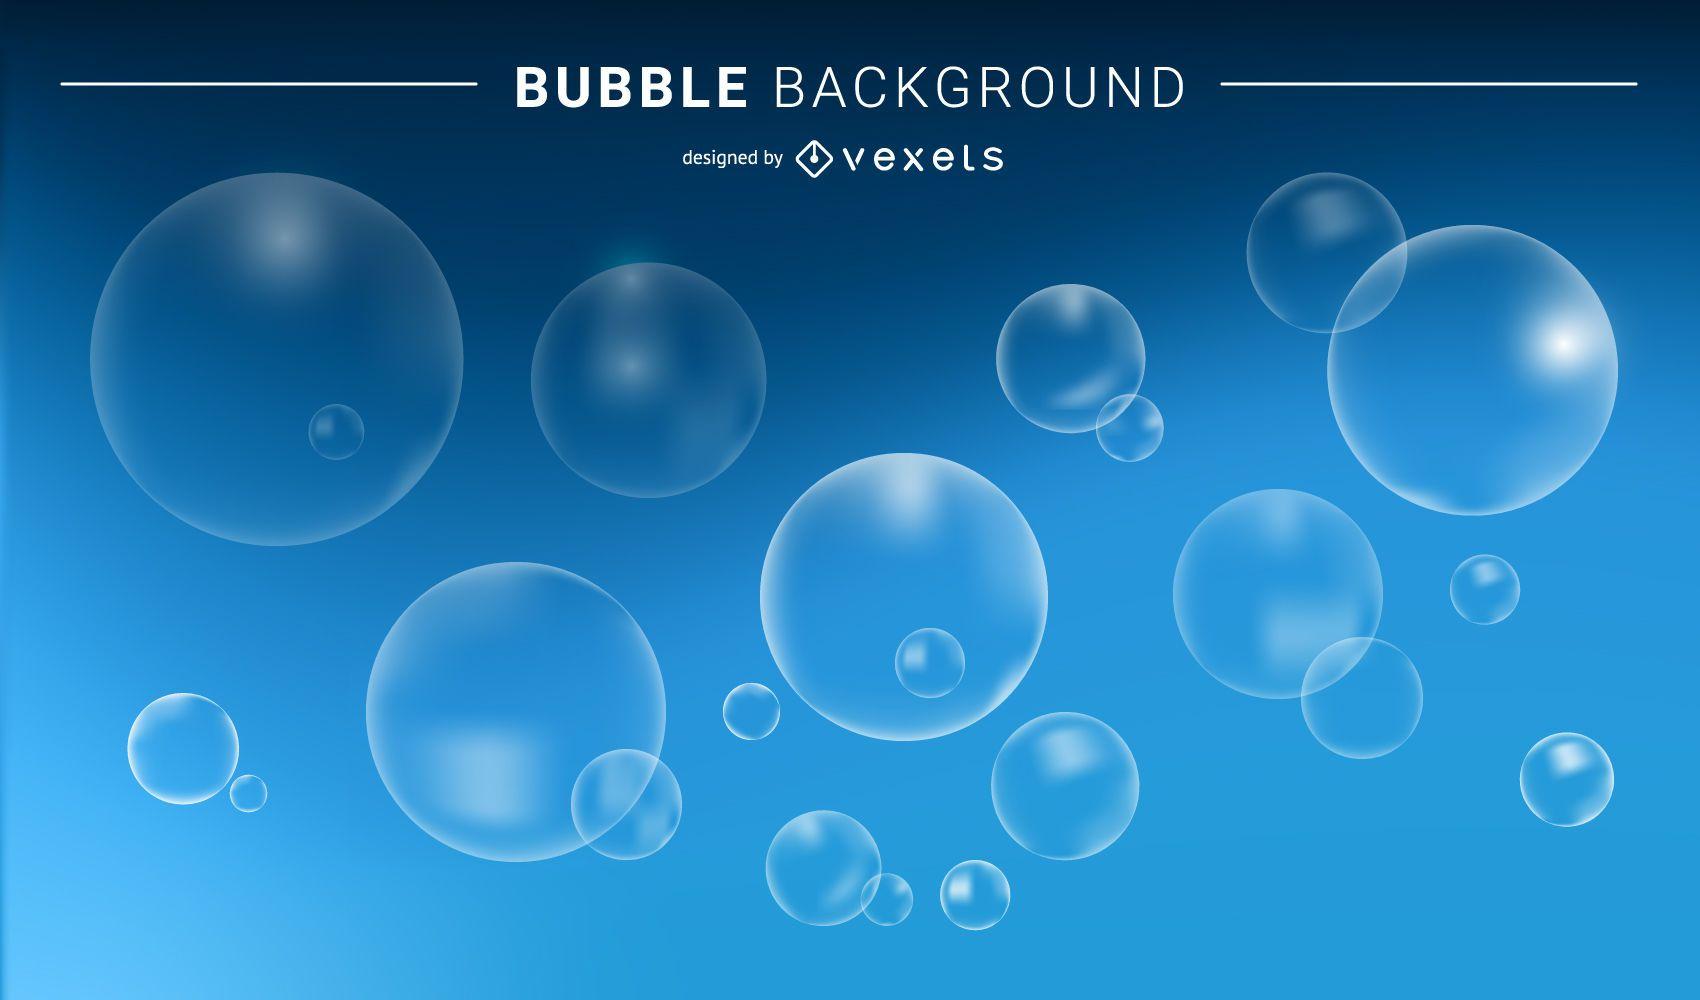 Transparent bubbles and blue background